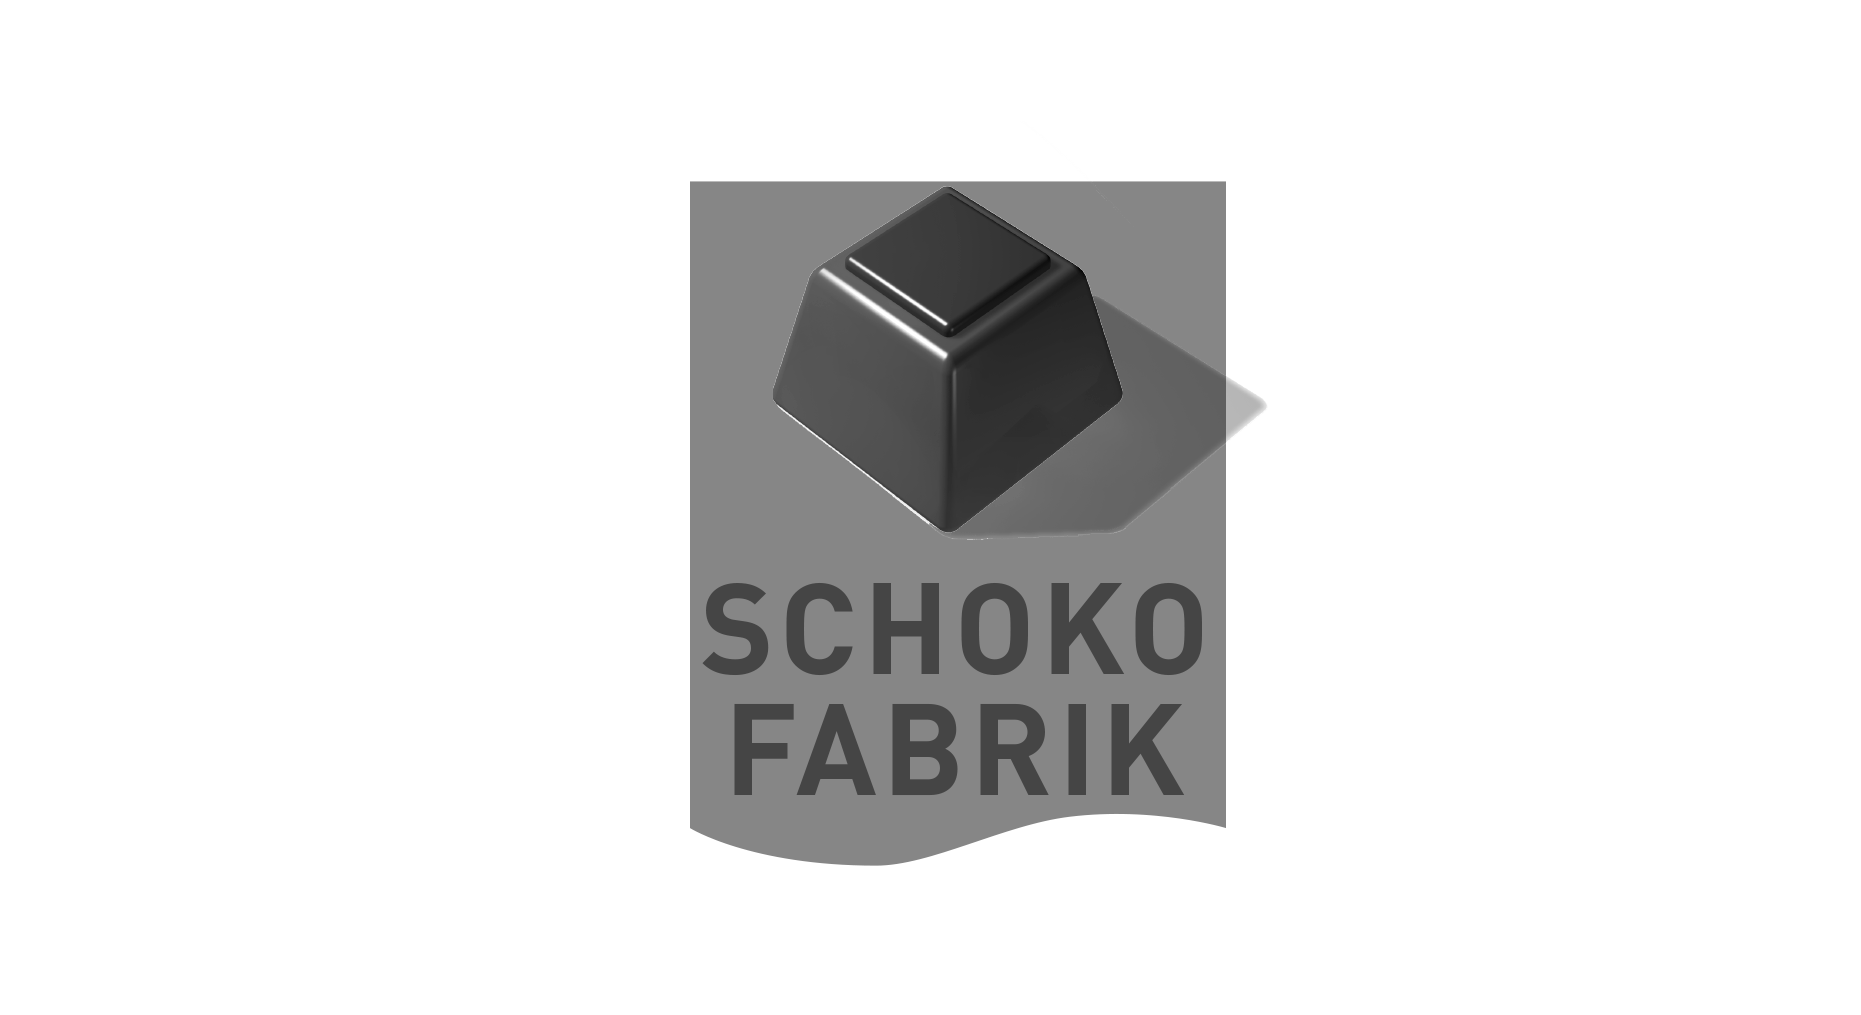 schoko.png